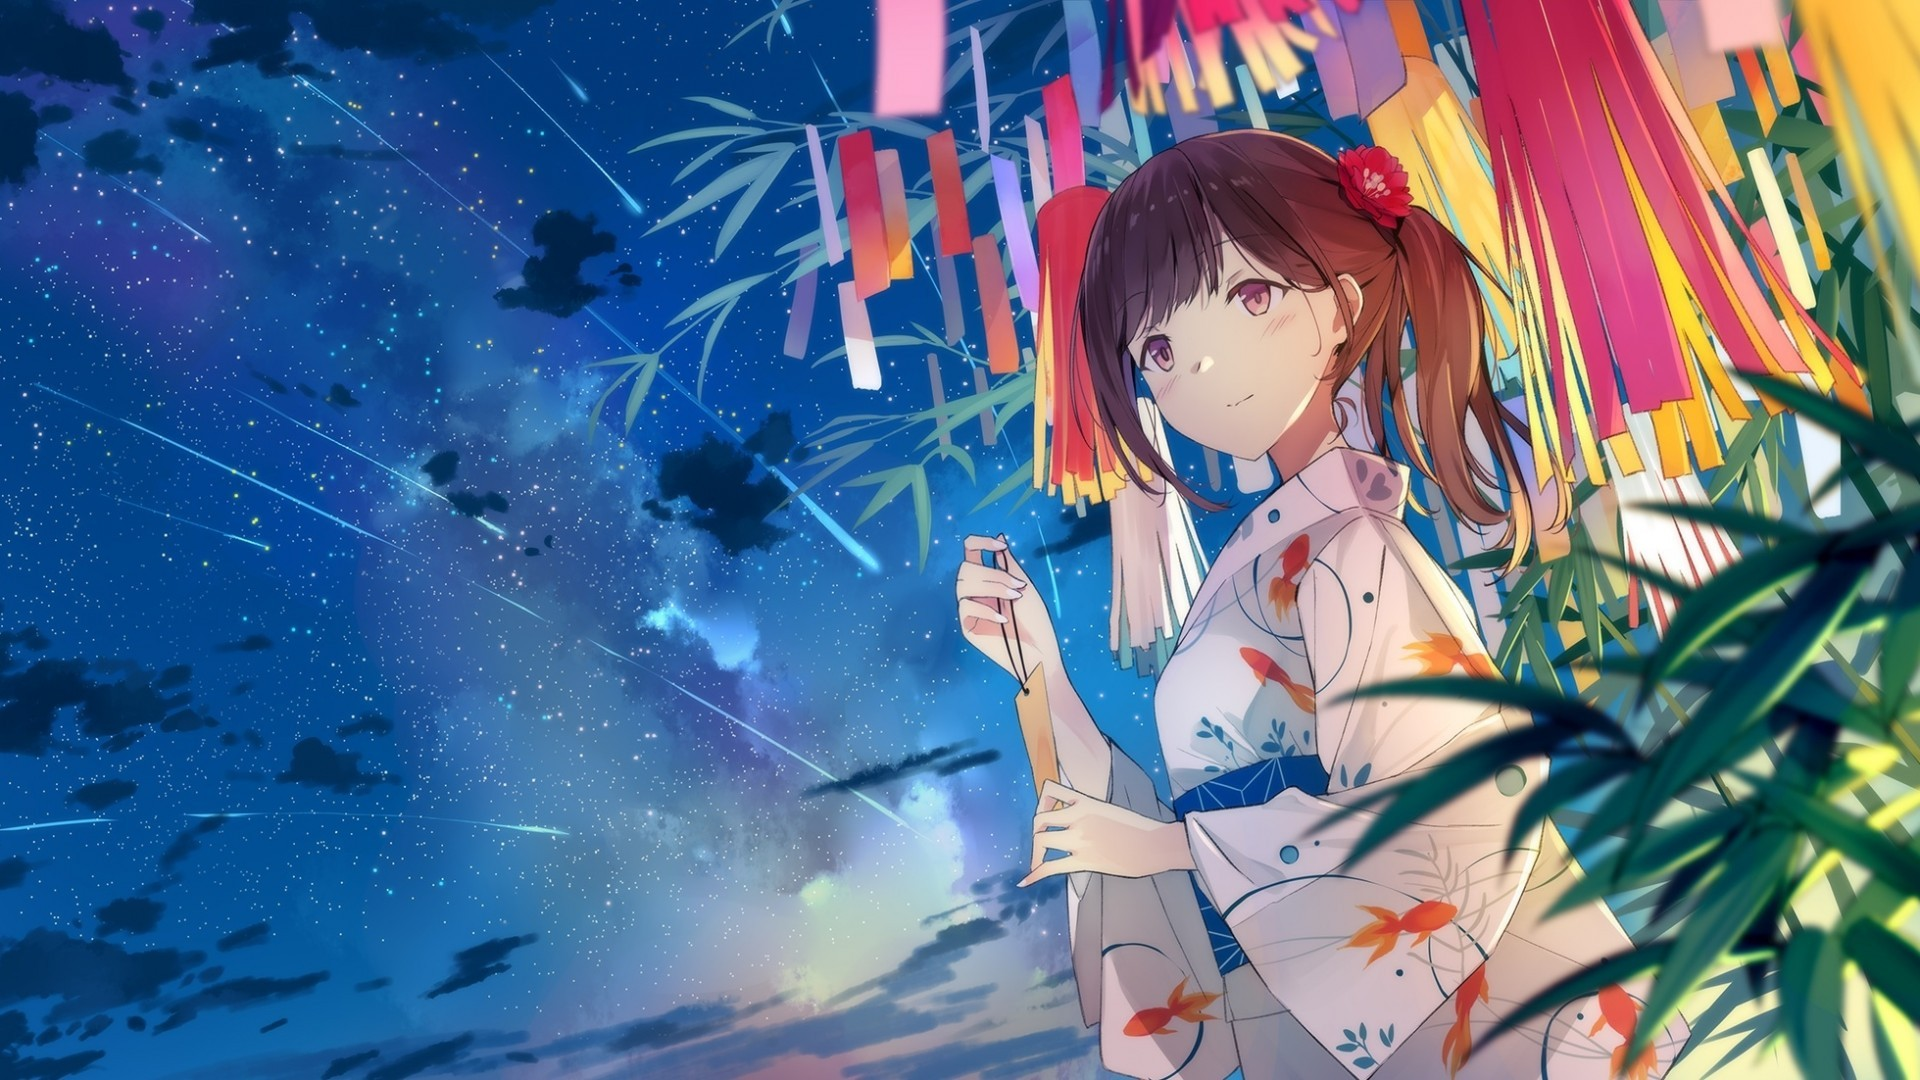 Download 1920x1080 Anime Girl Falling Stars Scenic Yukata 1920x1080